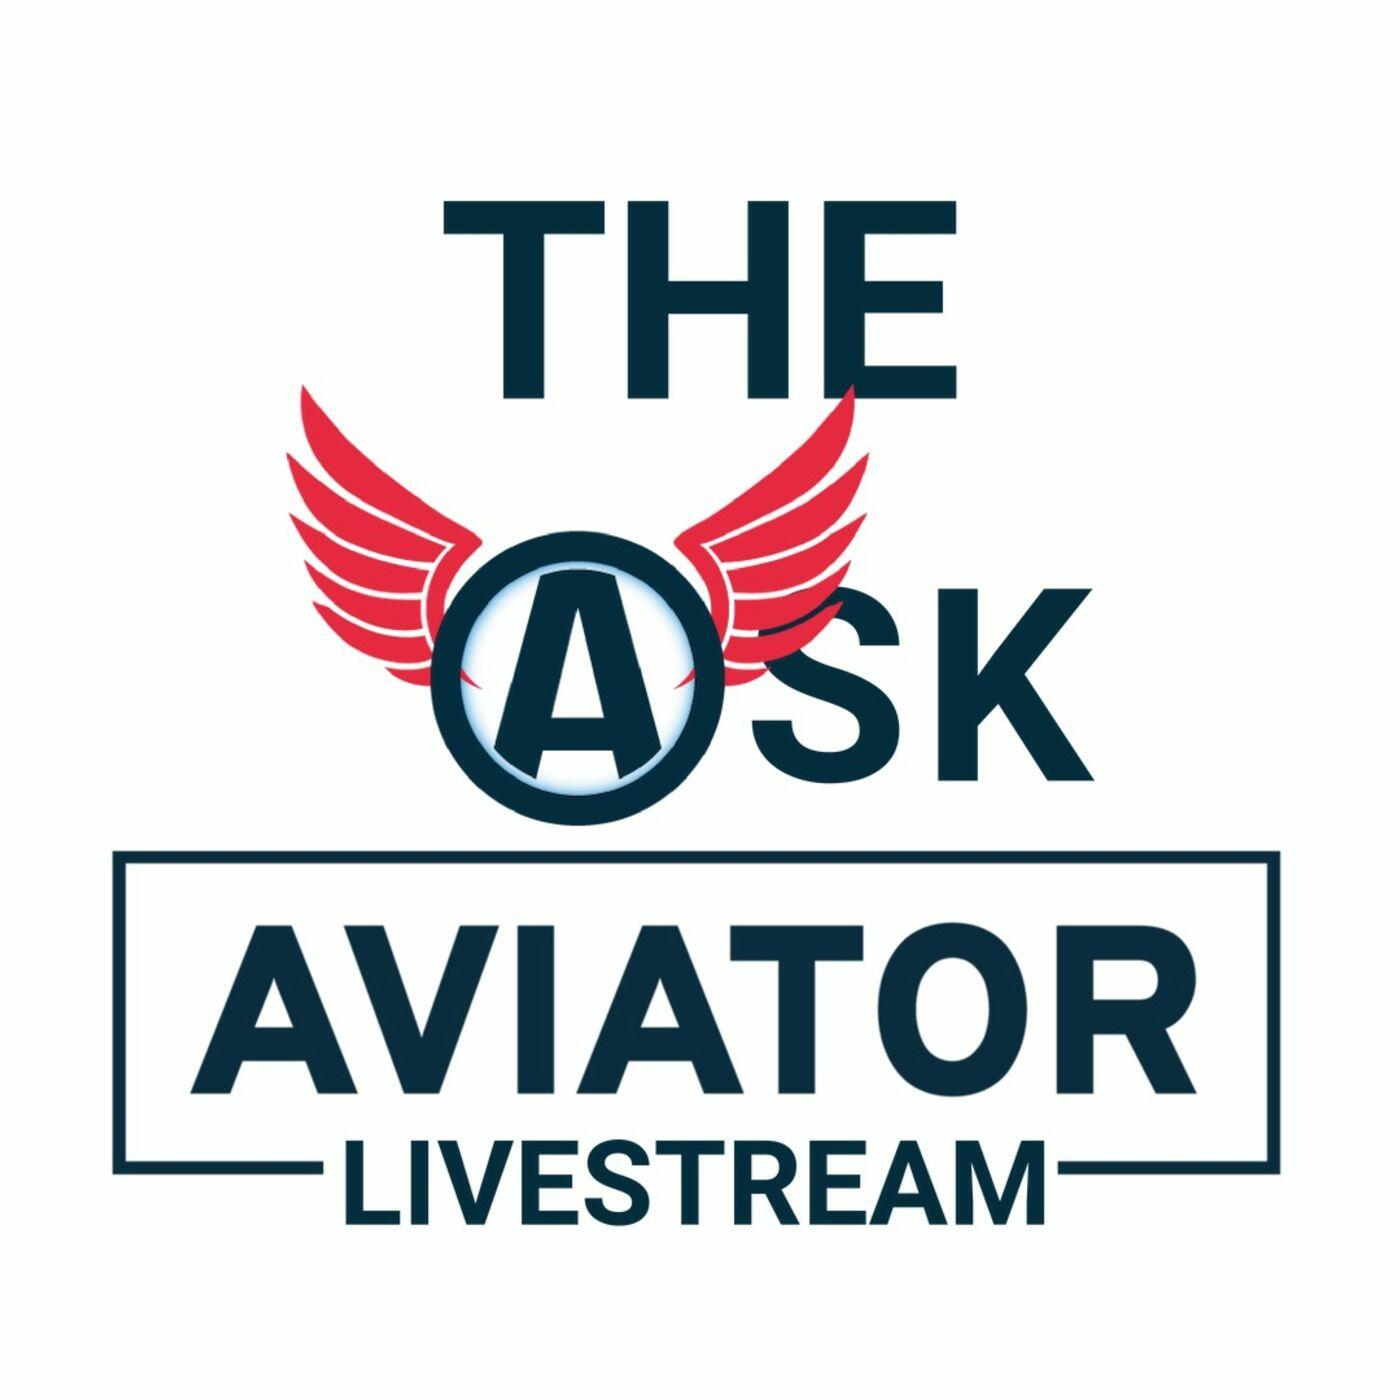 Ask Aviator Livestream & Podcast